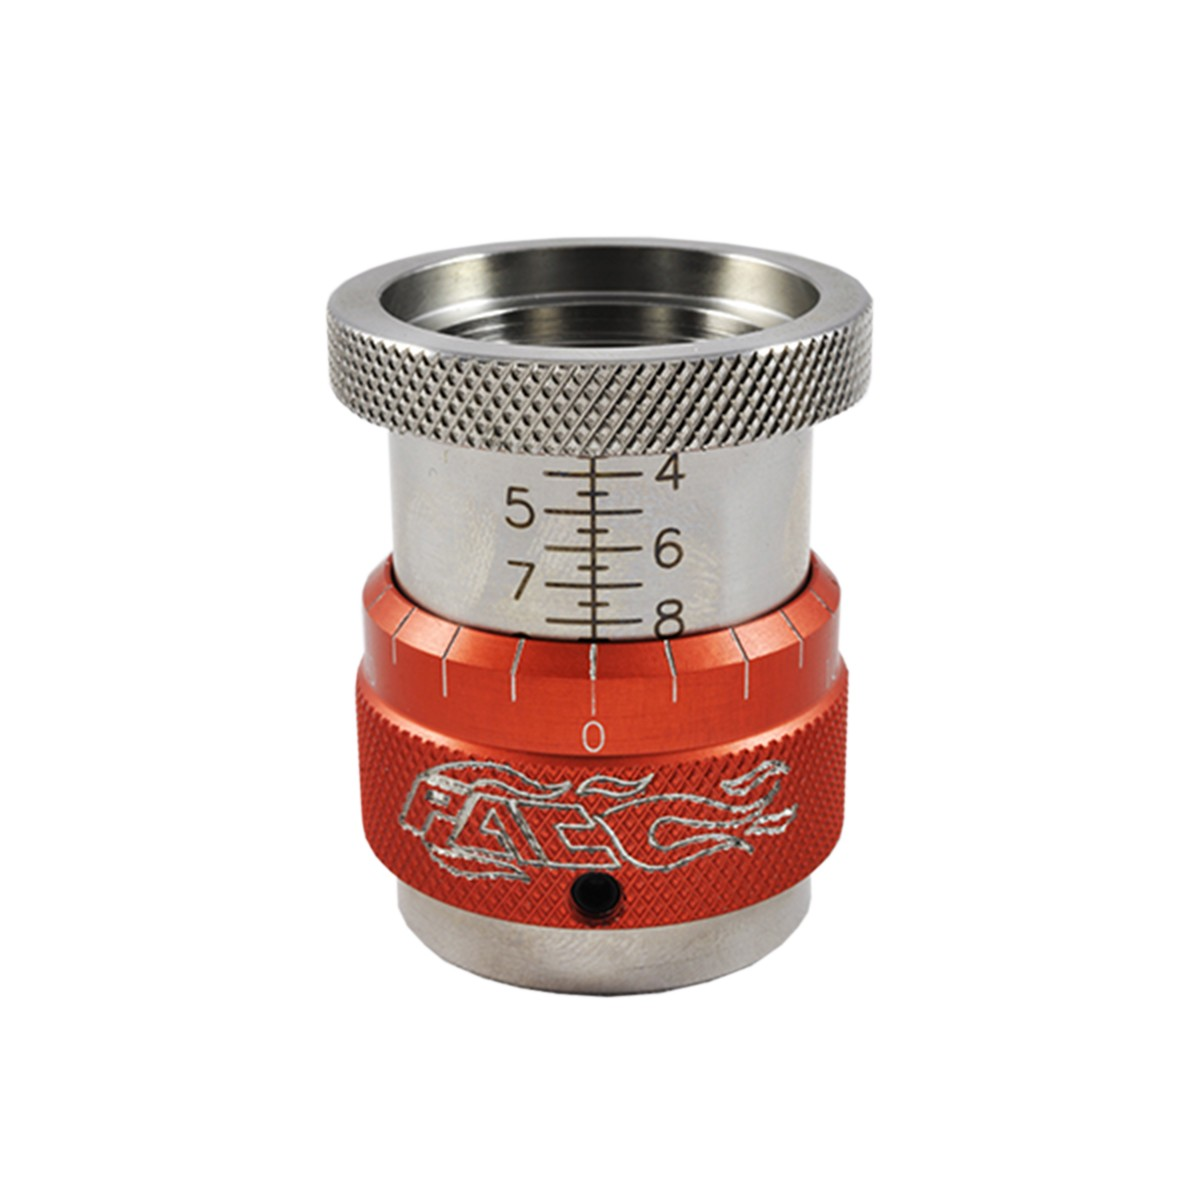 PAC-T903 Installed Height Gauge - Engine Builders 1.400-1.900 Range Orange